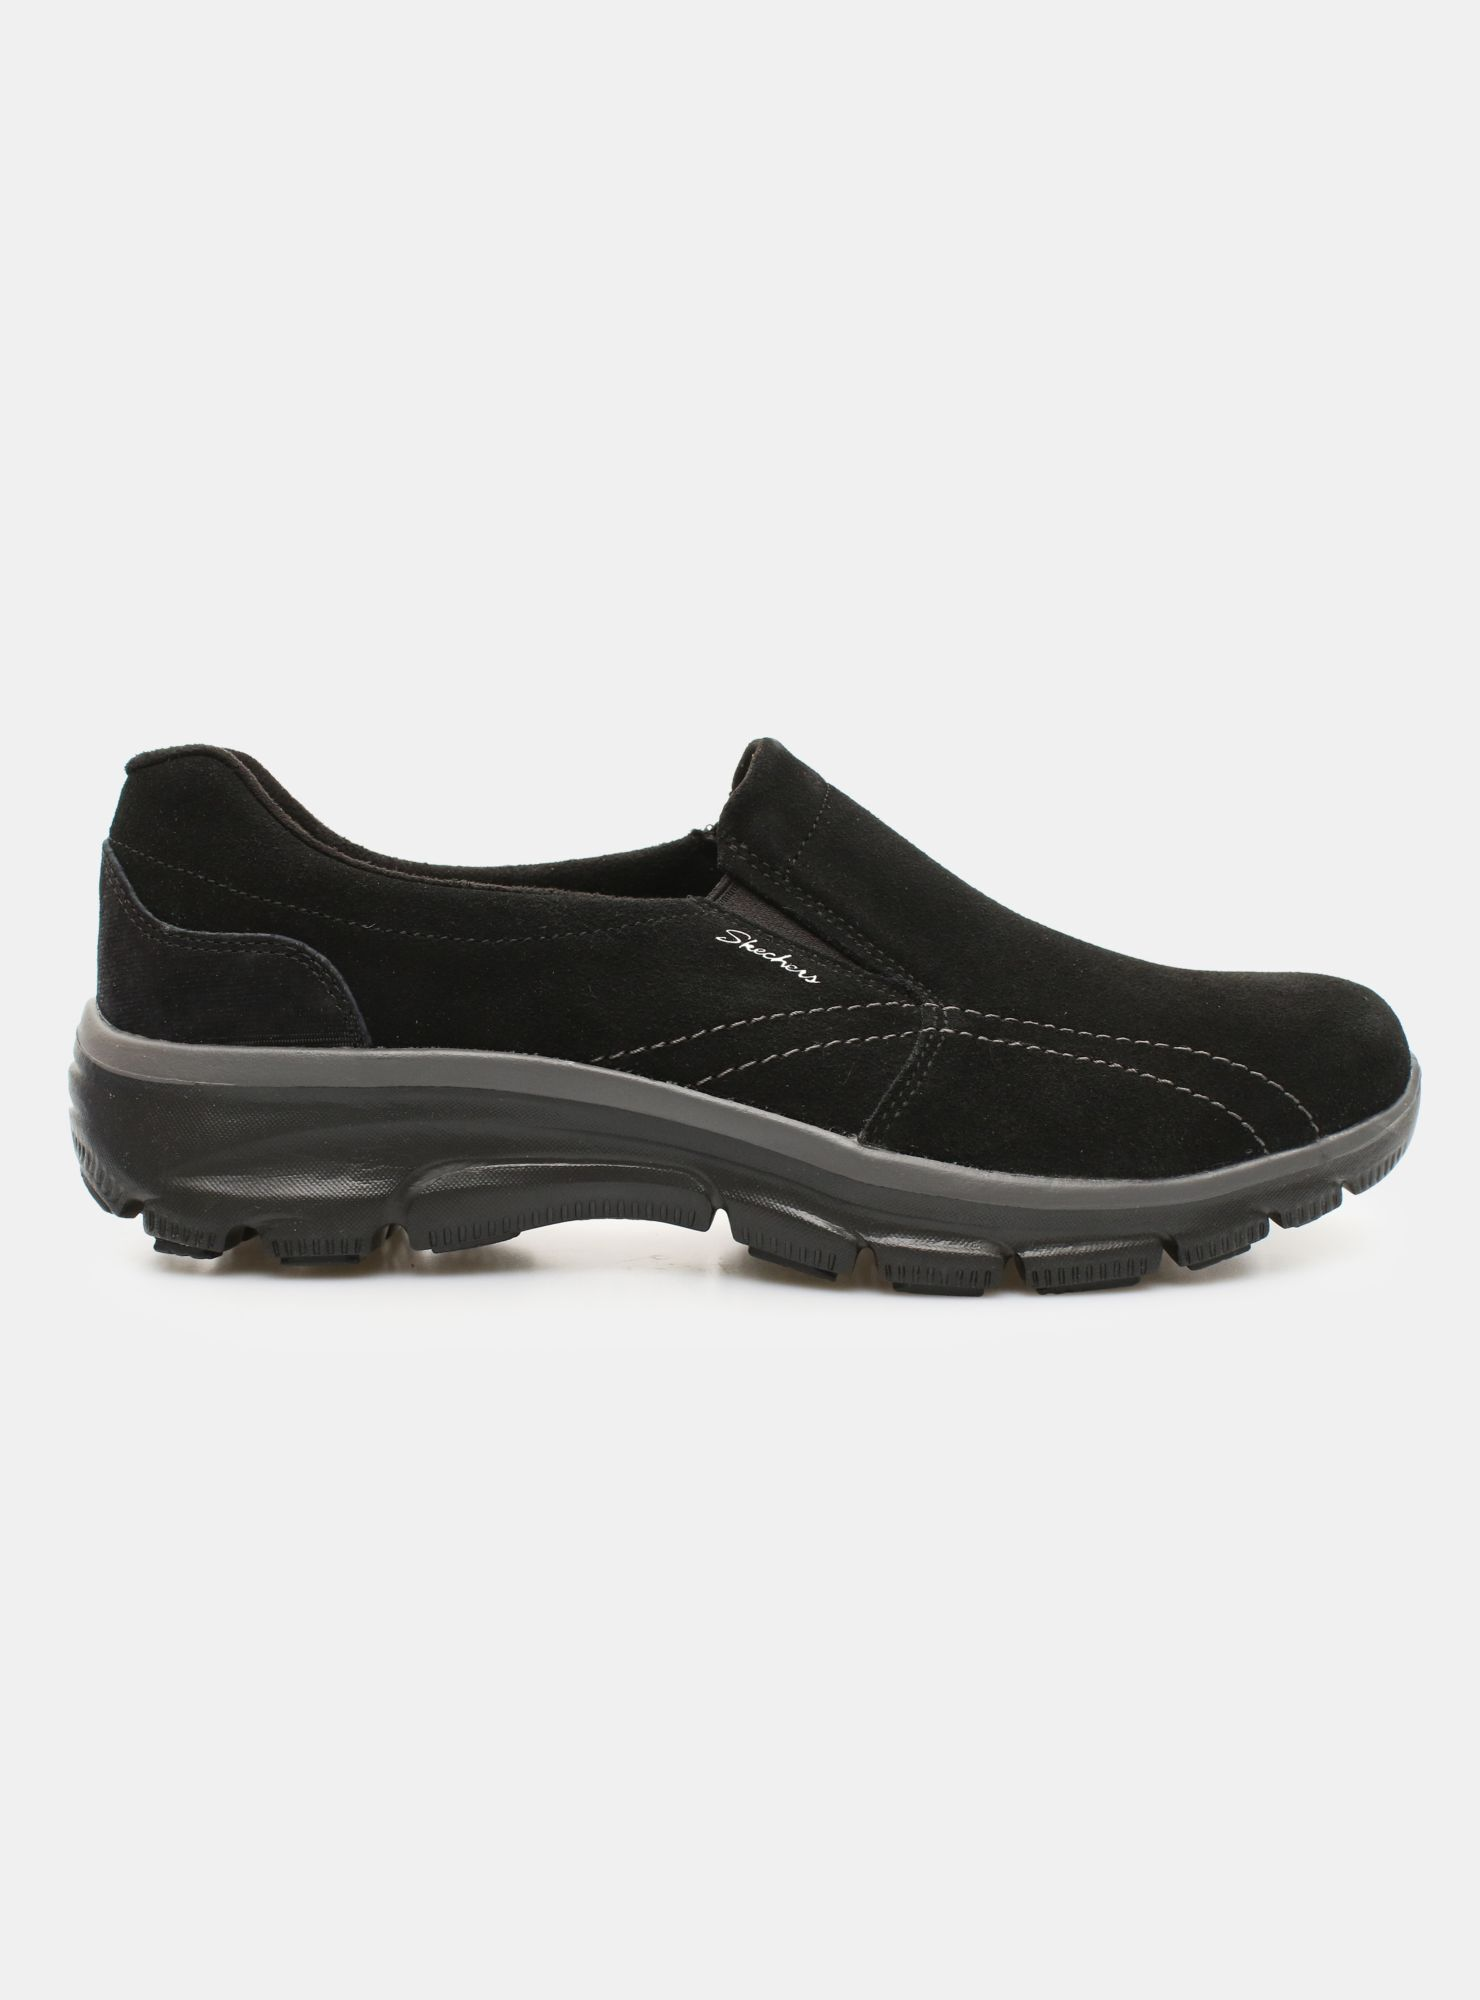 Urbana Skechers Zapatos Casuales Mujer Zapatilla 49129 Skx Paris wtqdU87